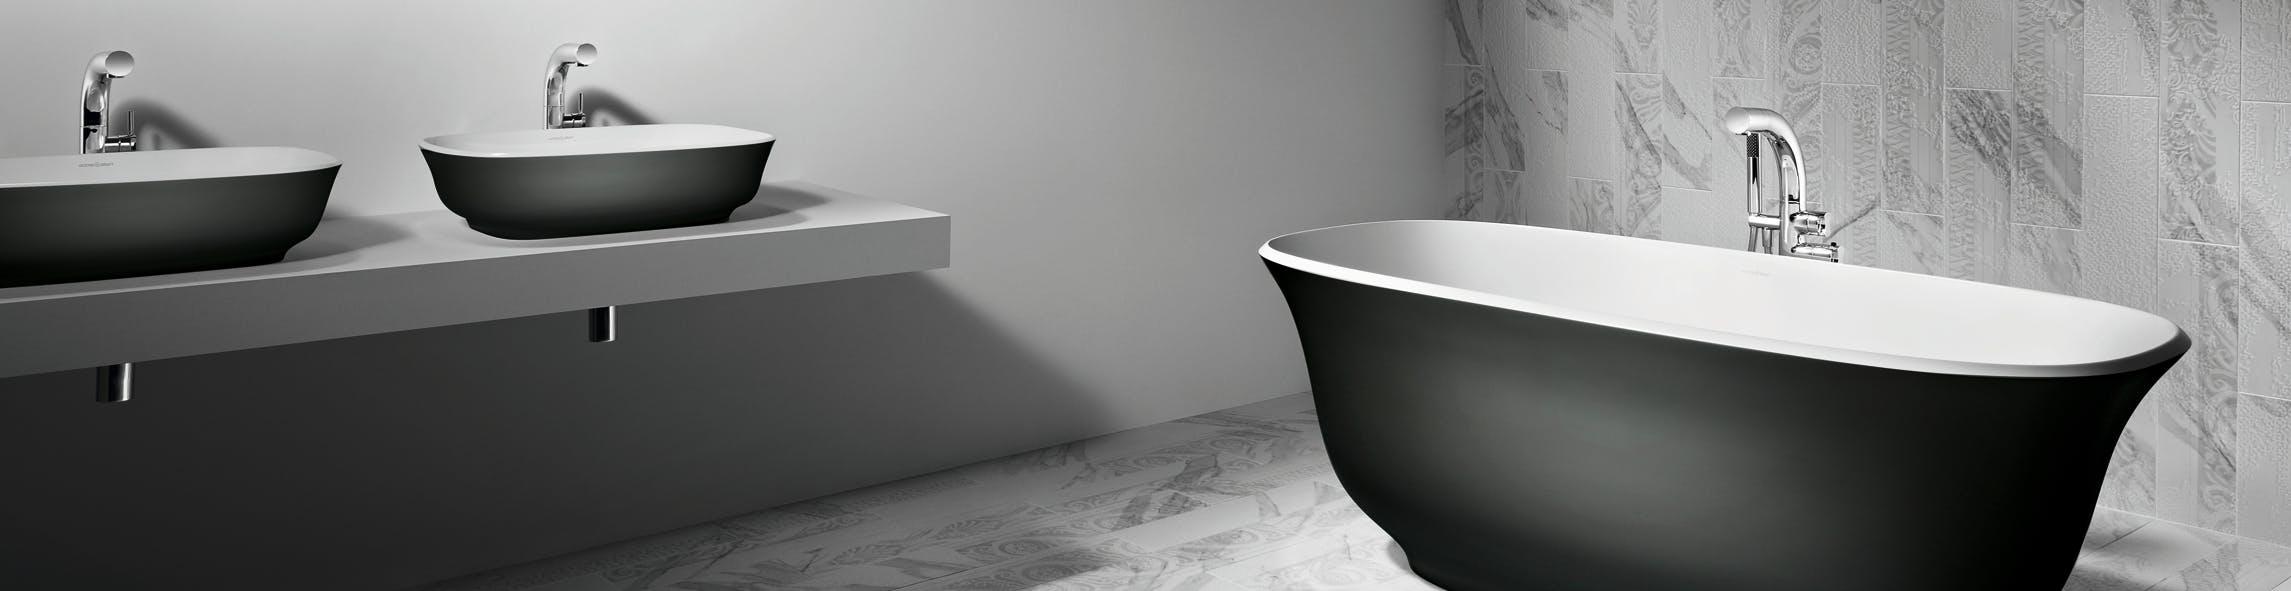 Tiles, Bathroom Tiles, Floor Tiles, Mosaic Tiles, Tiling | Domayne